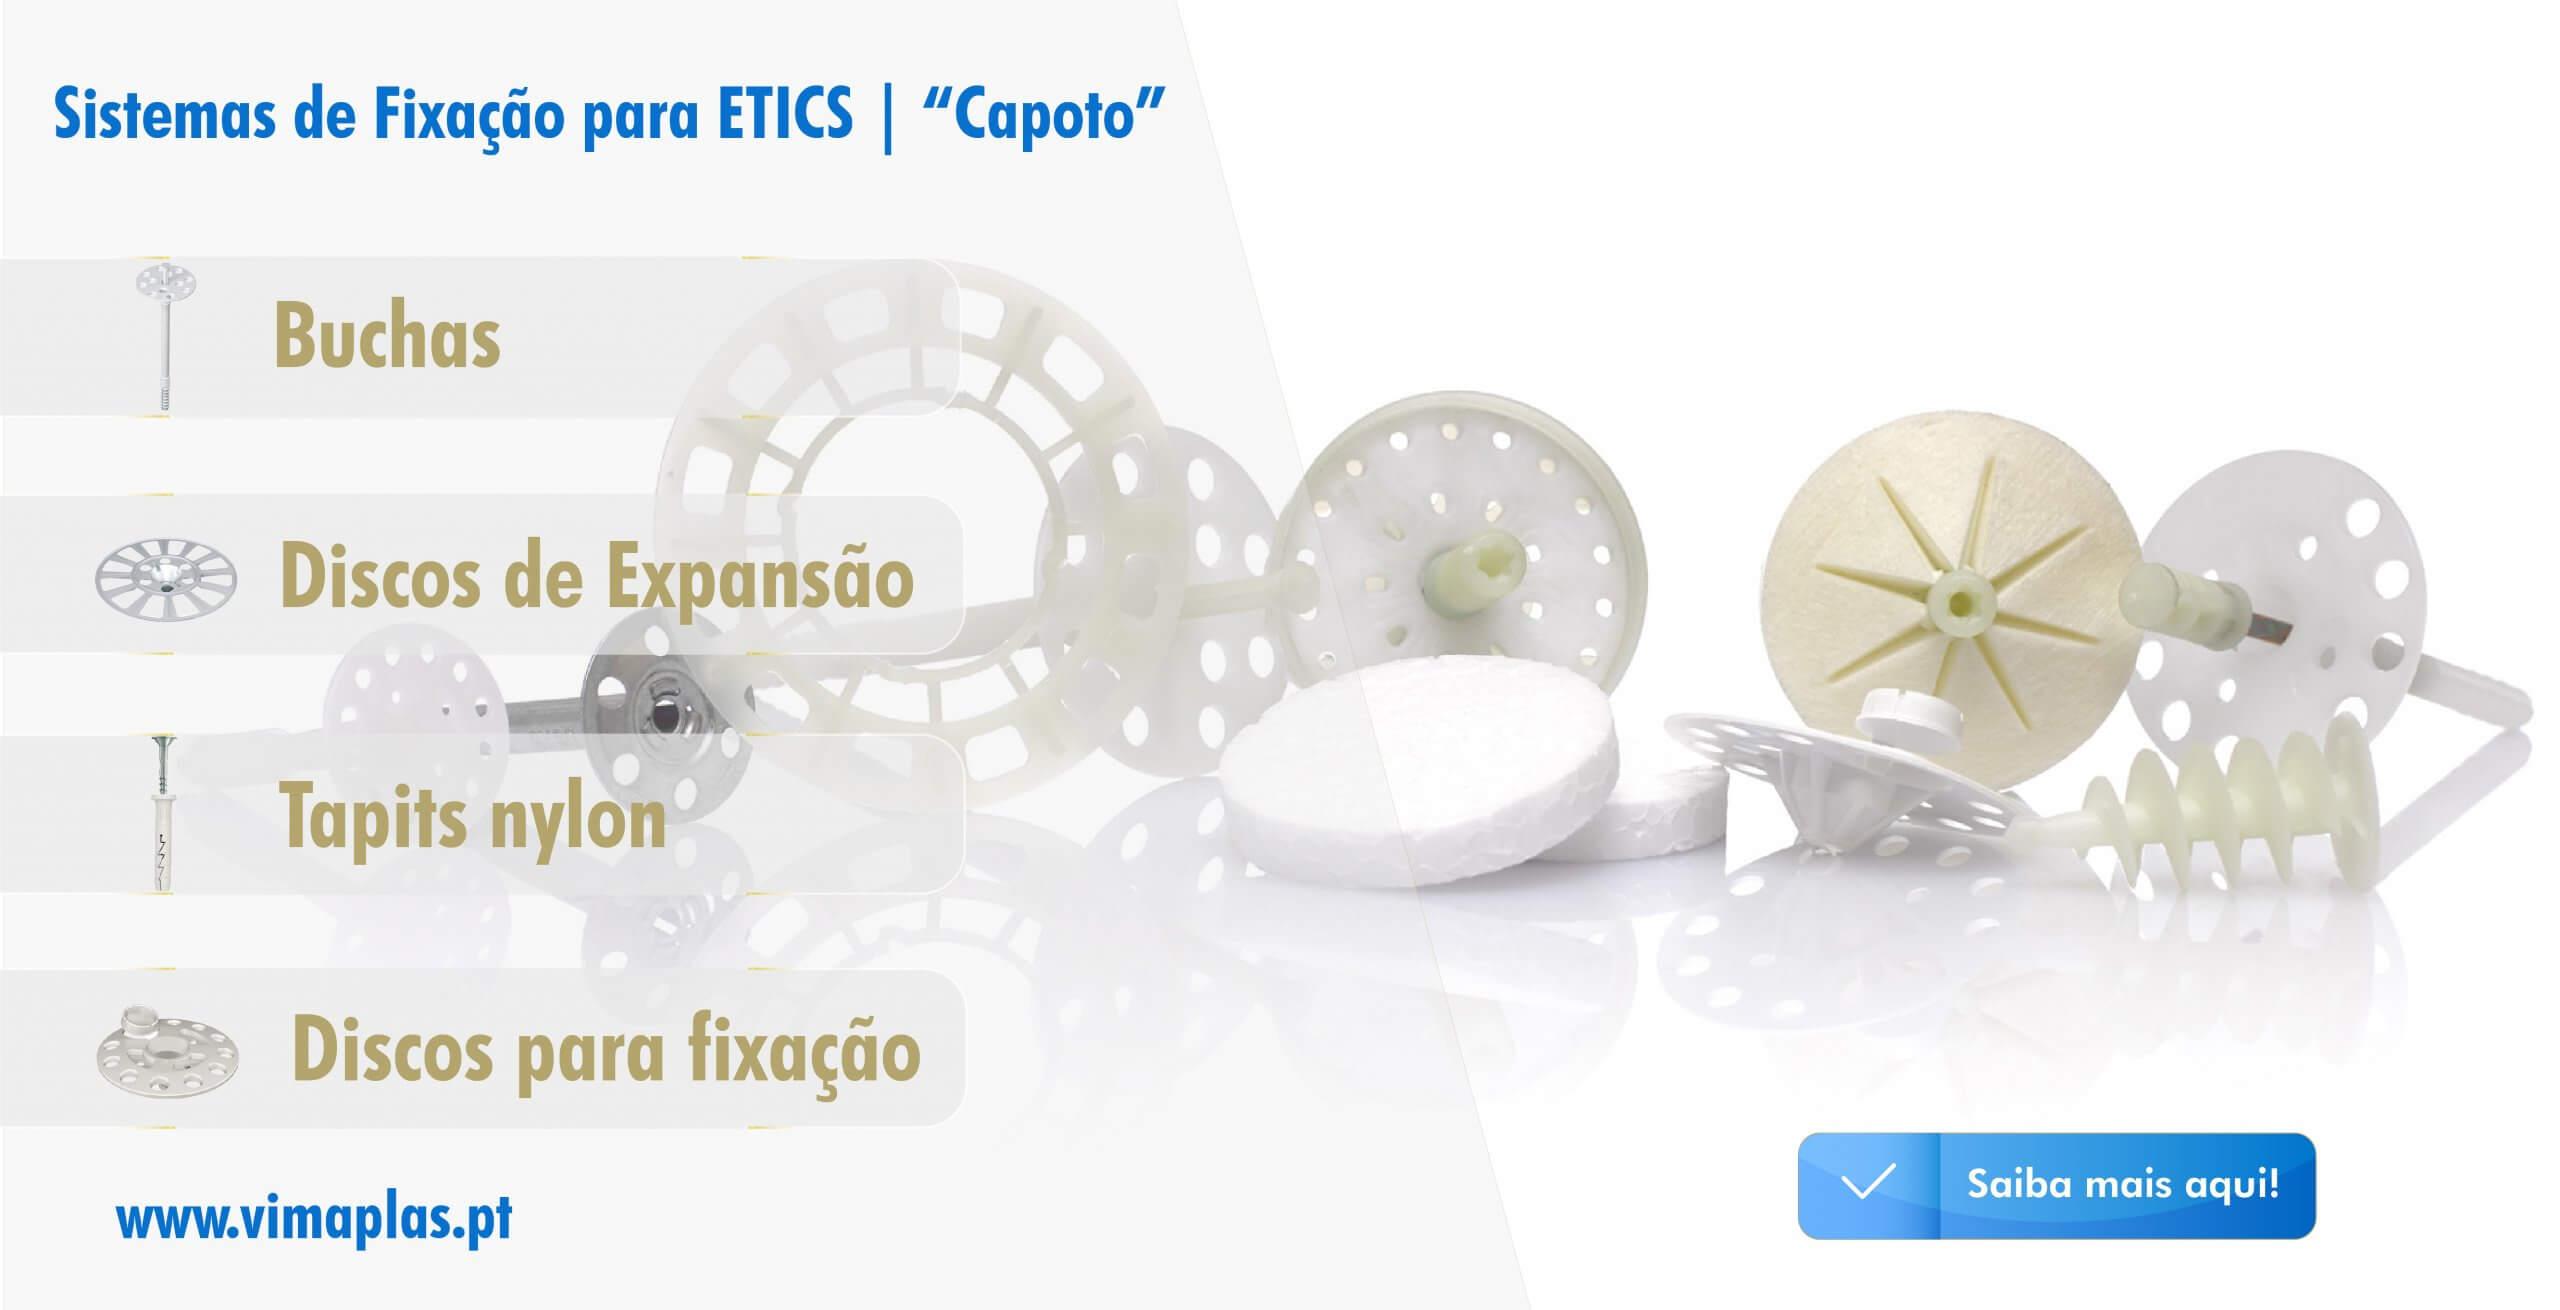 VimaFix Sistemas Fixação ETICS   Capoto